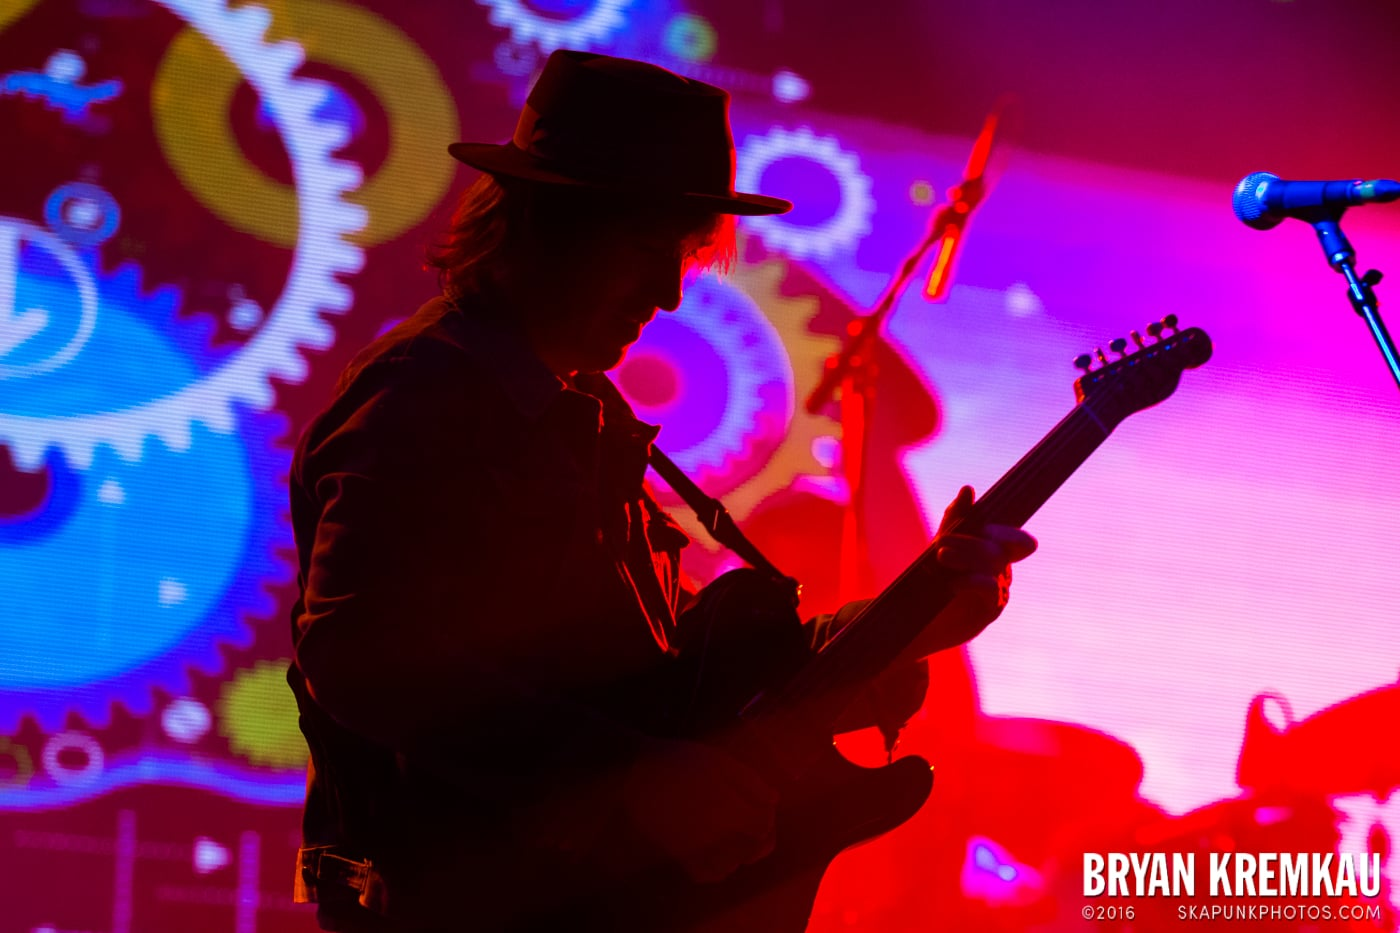 Willie Nile @ Highline Ballroom, NYC - 12.26.14 (71)